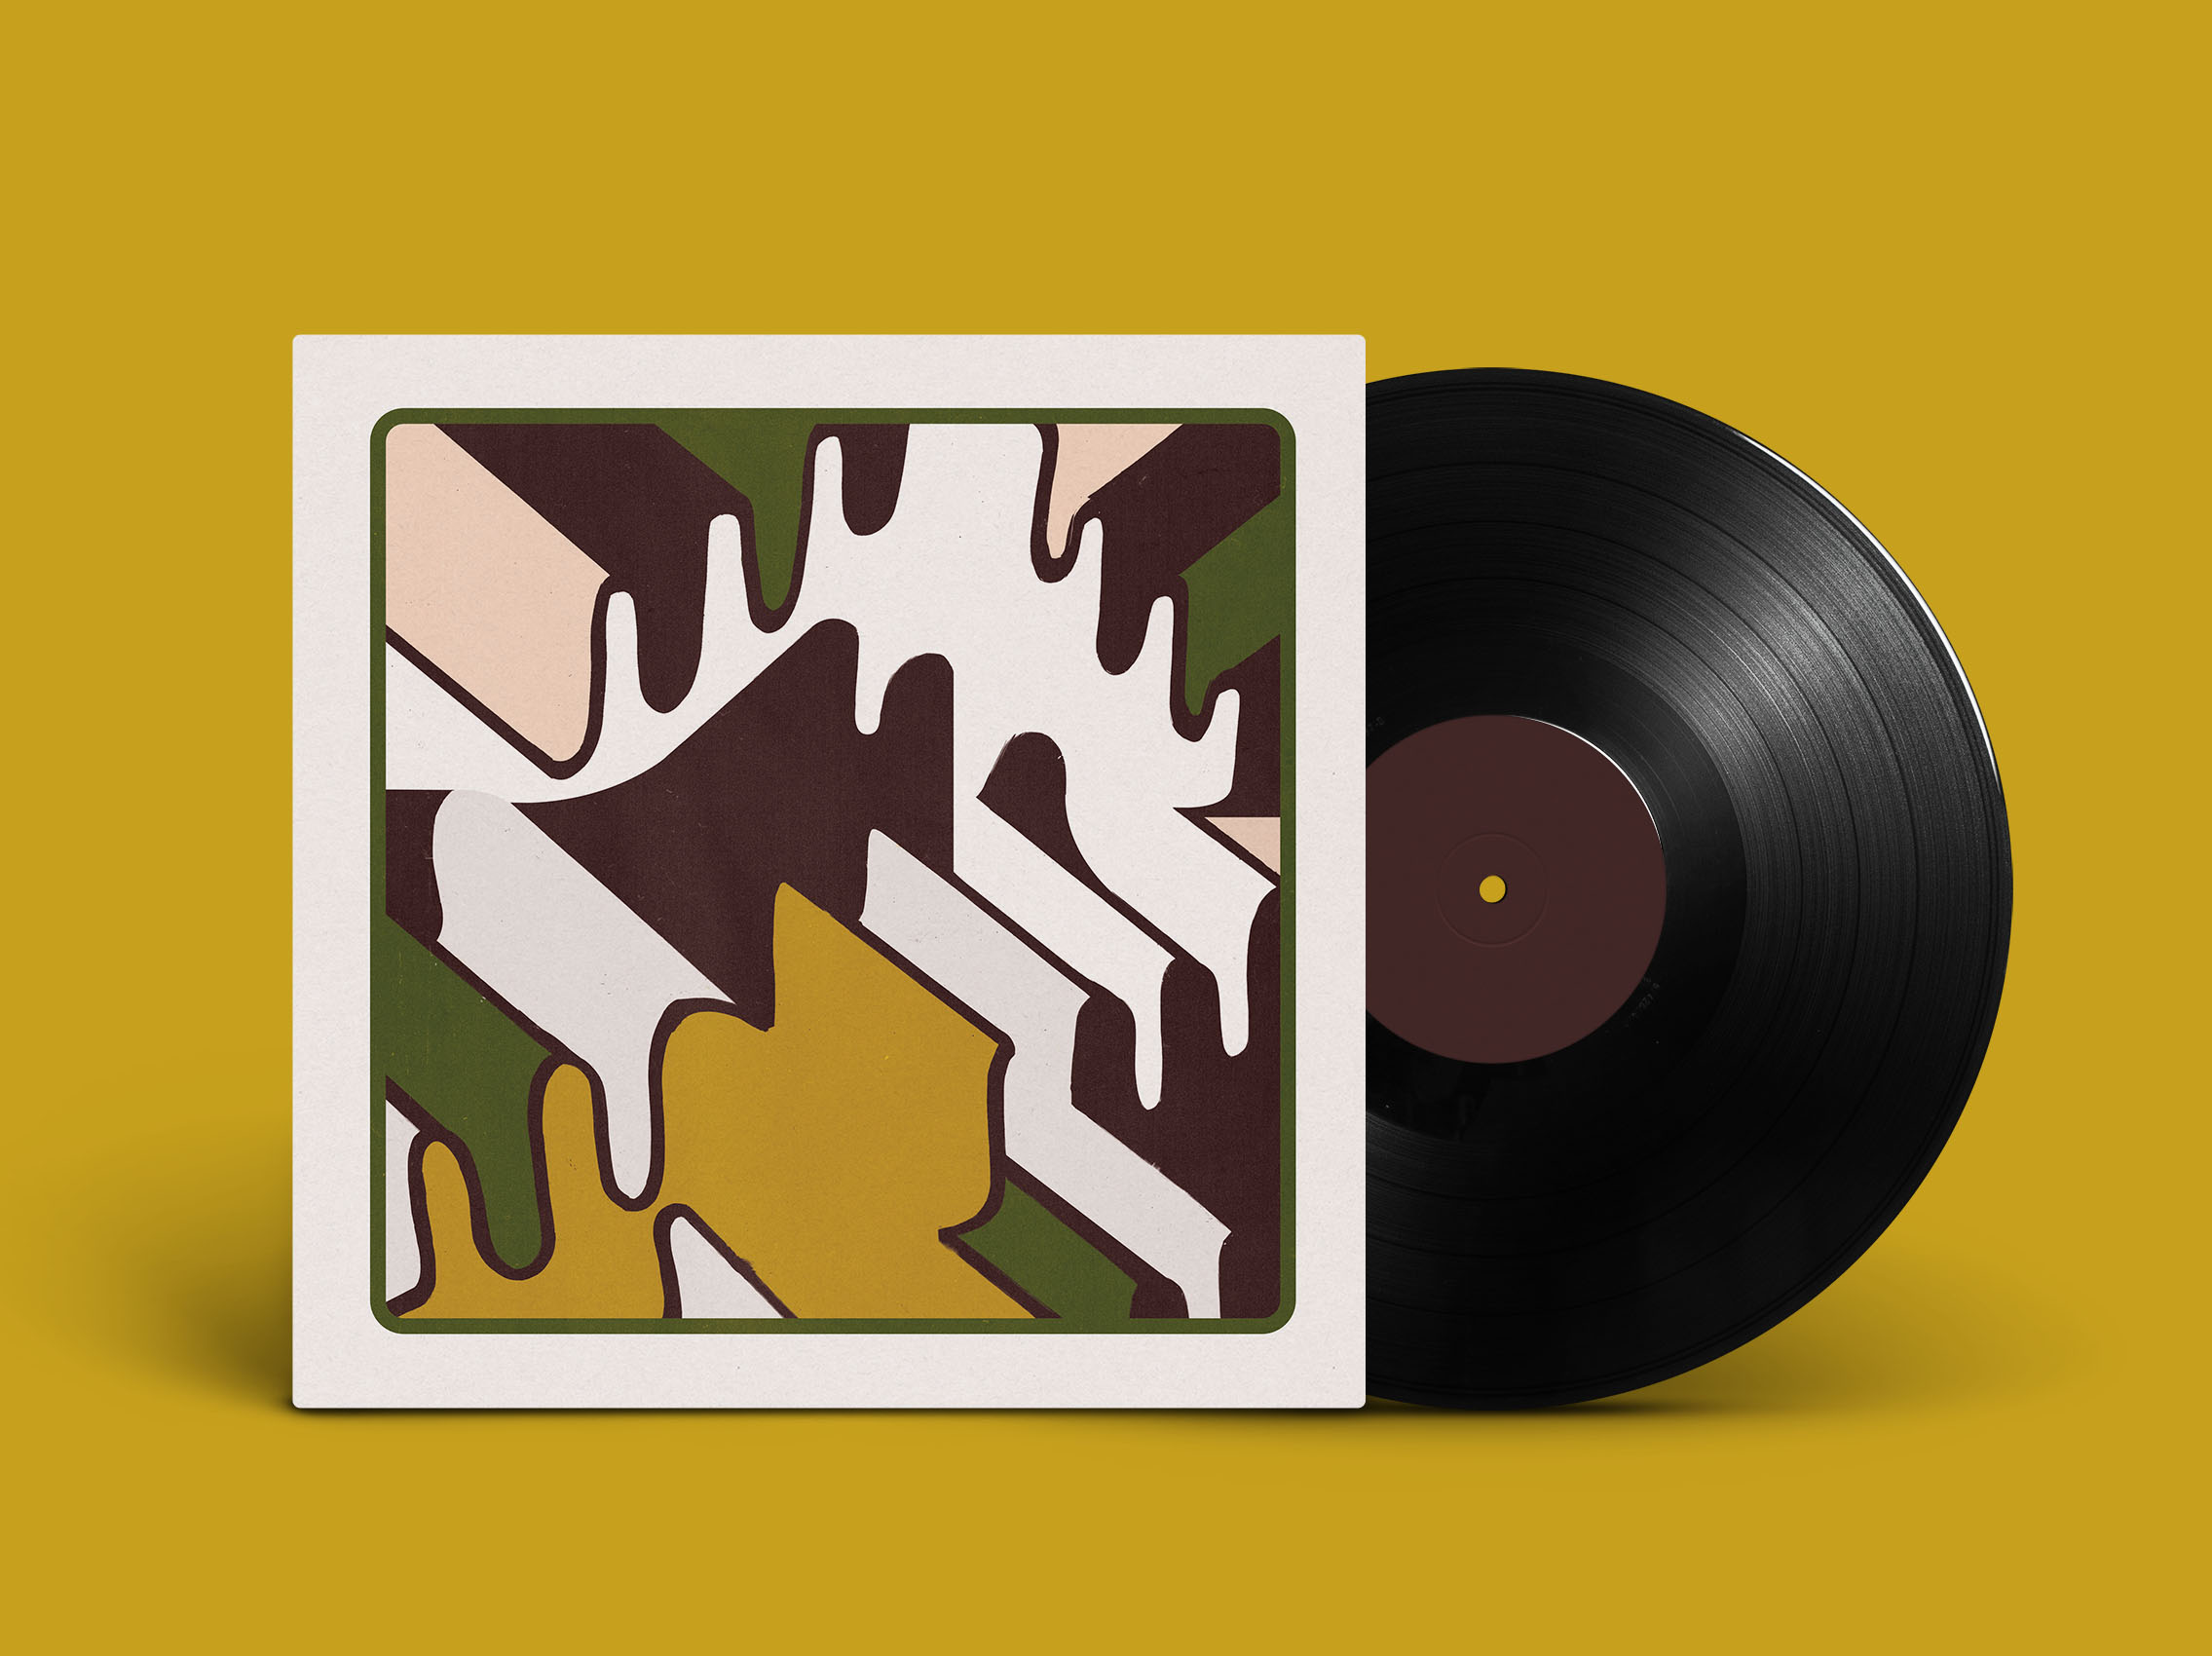 Jaya - 'Fallen' EP Release, 2019.